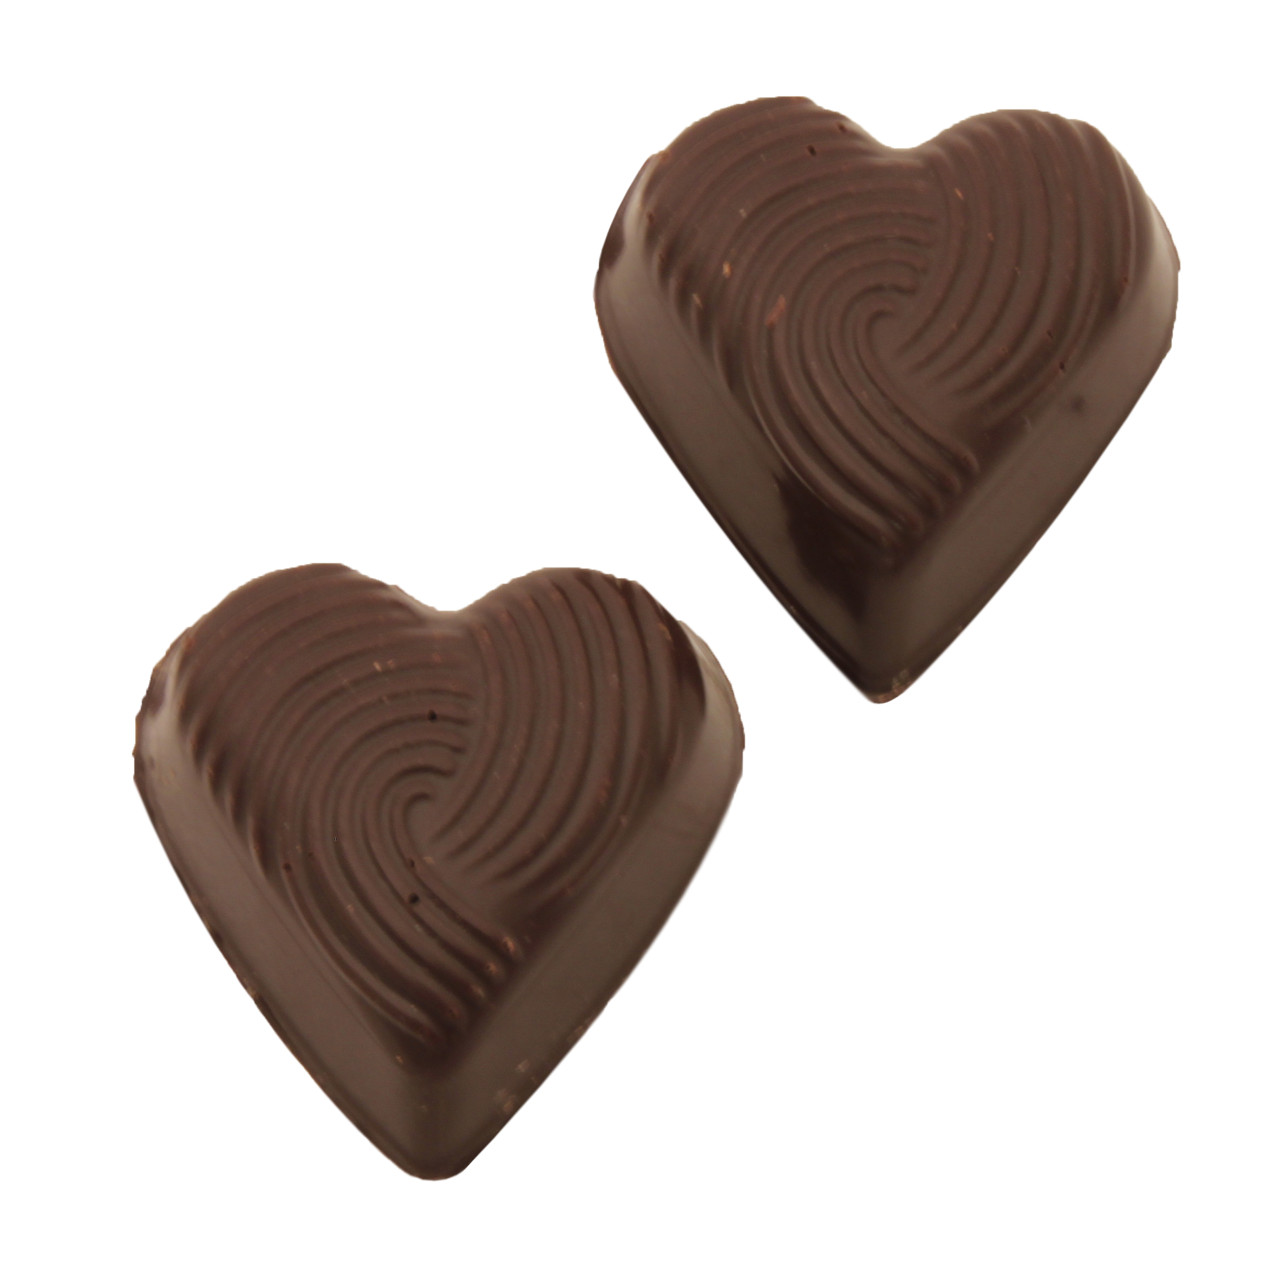 Pralinhuset - Small Hearts - Mörk Choklad